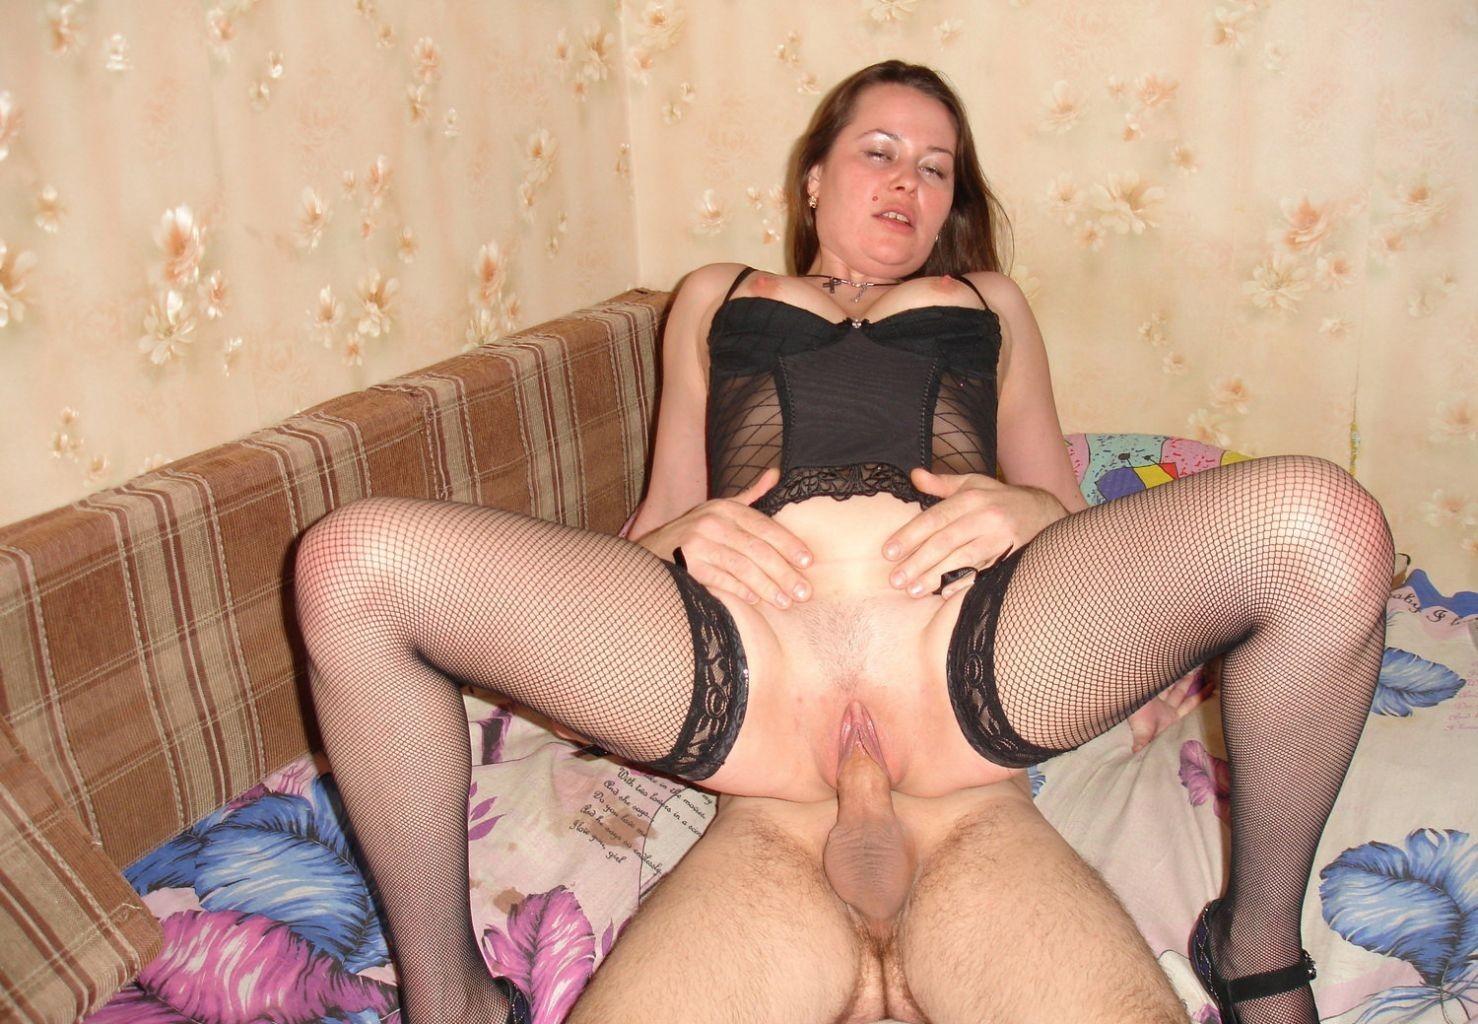 Просто фото домашнего секса - компиляция 20